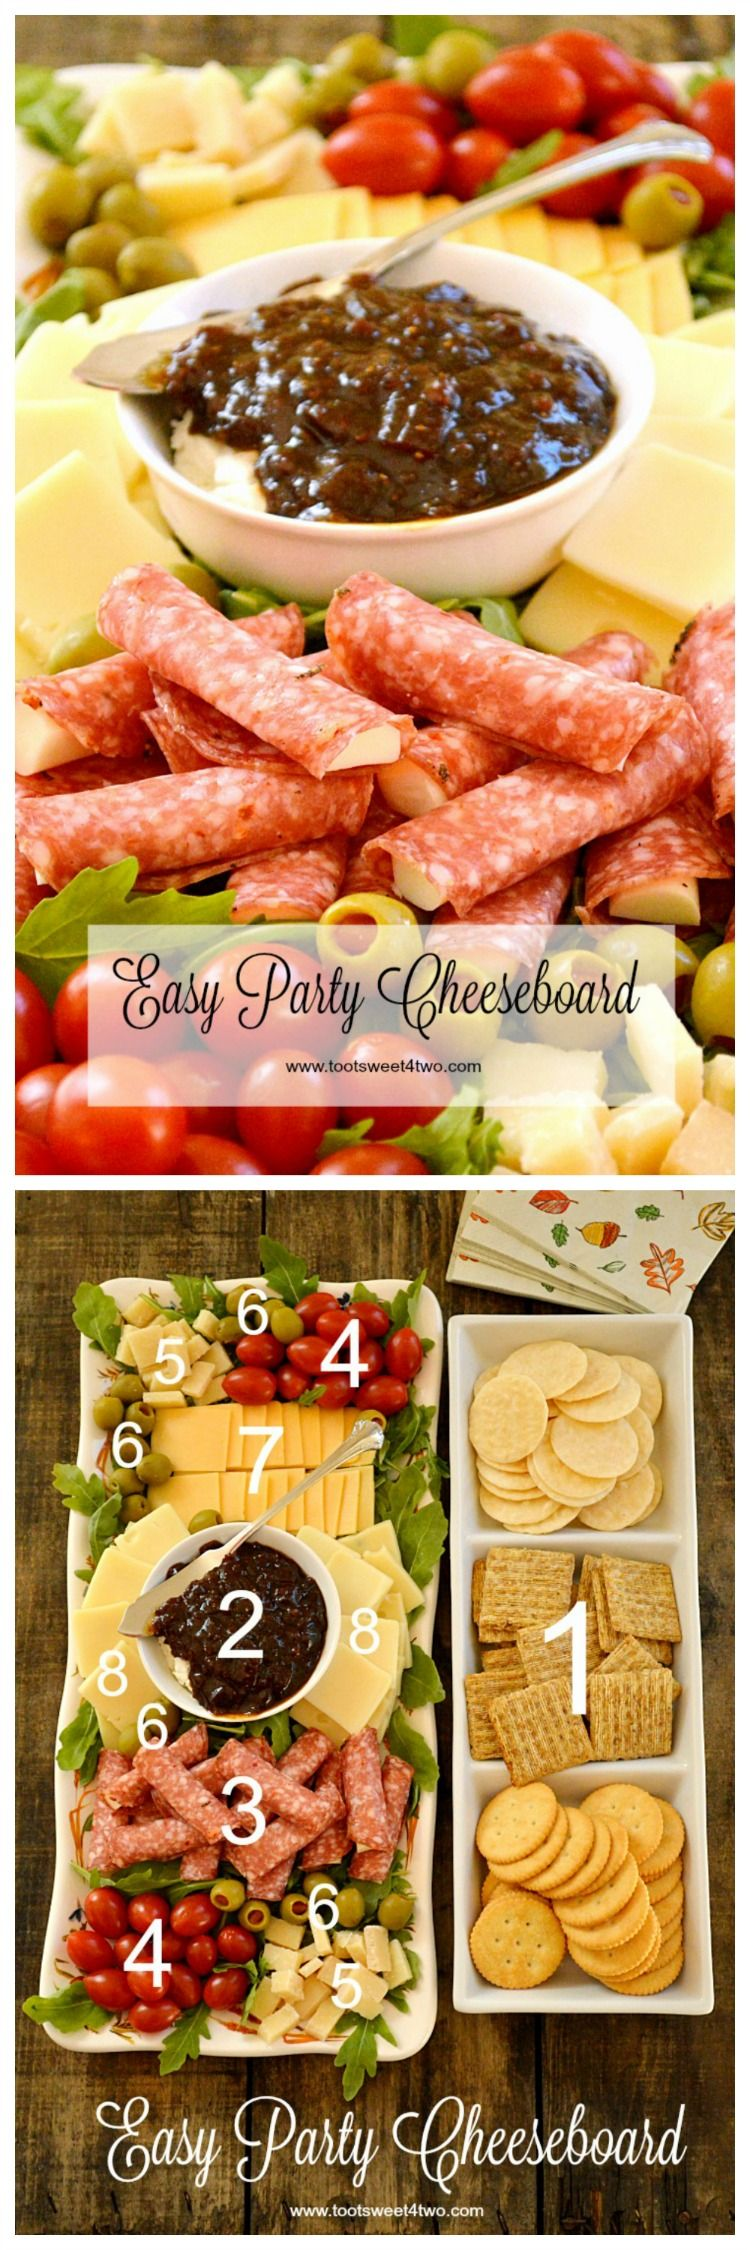 easy party cheeseboard rezept food pinterest vorspeise fingerfood und essen. Black Bedroom Furniture Sets. Home Design Ideas